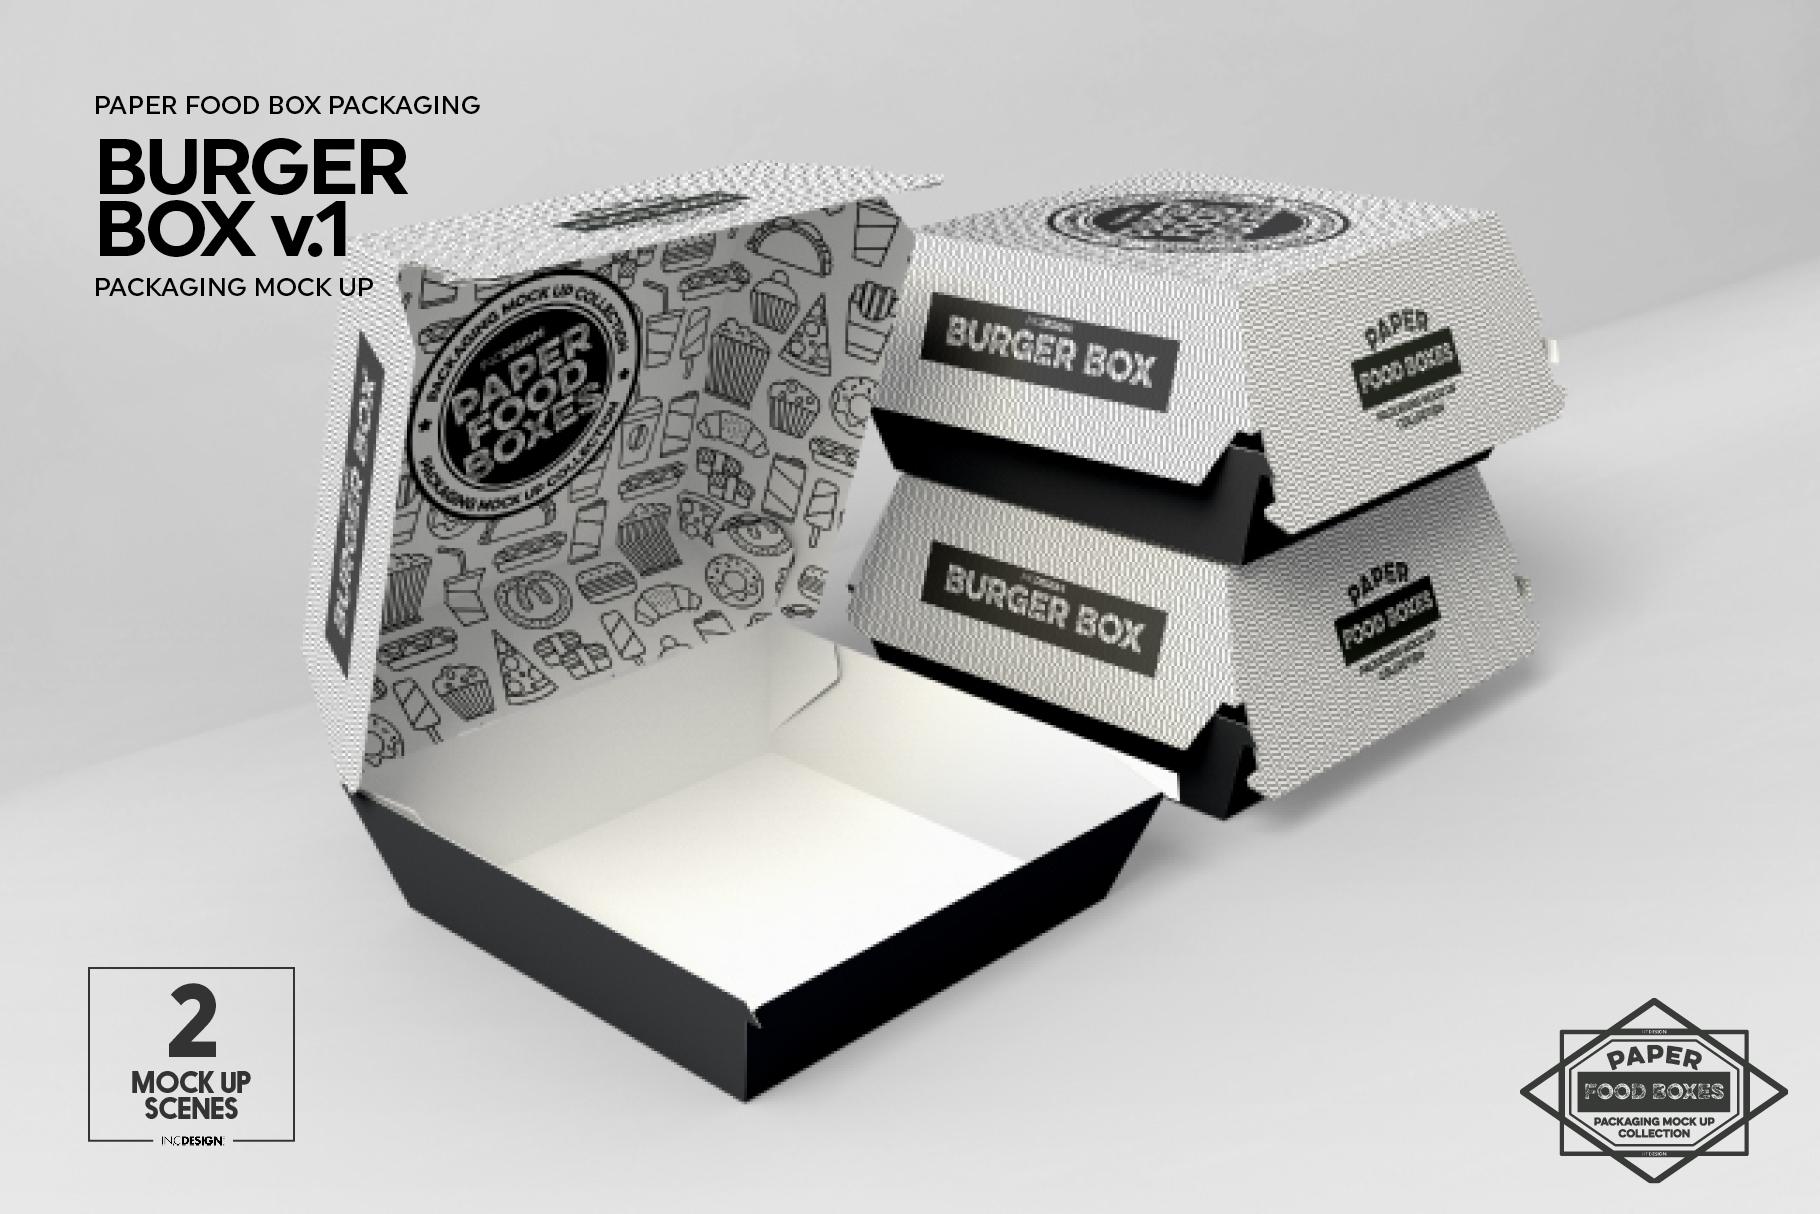 Burger Box Packaging Mock Up v1 example image 4